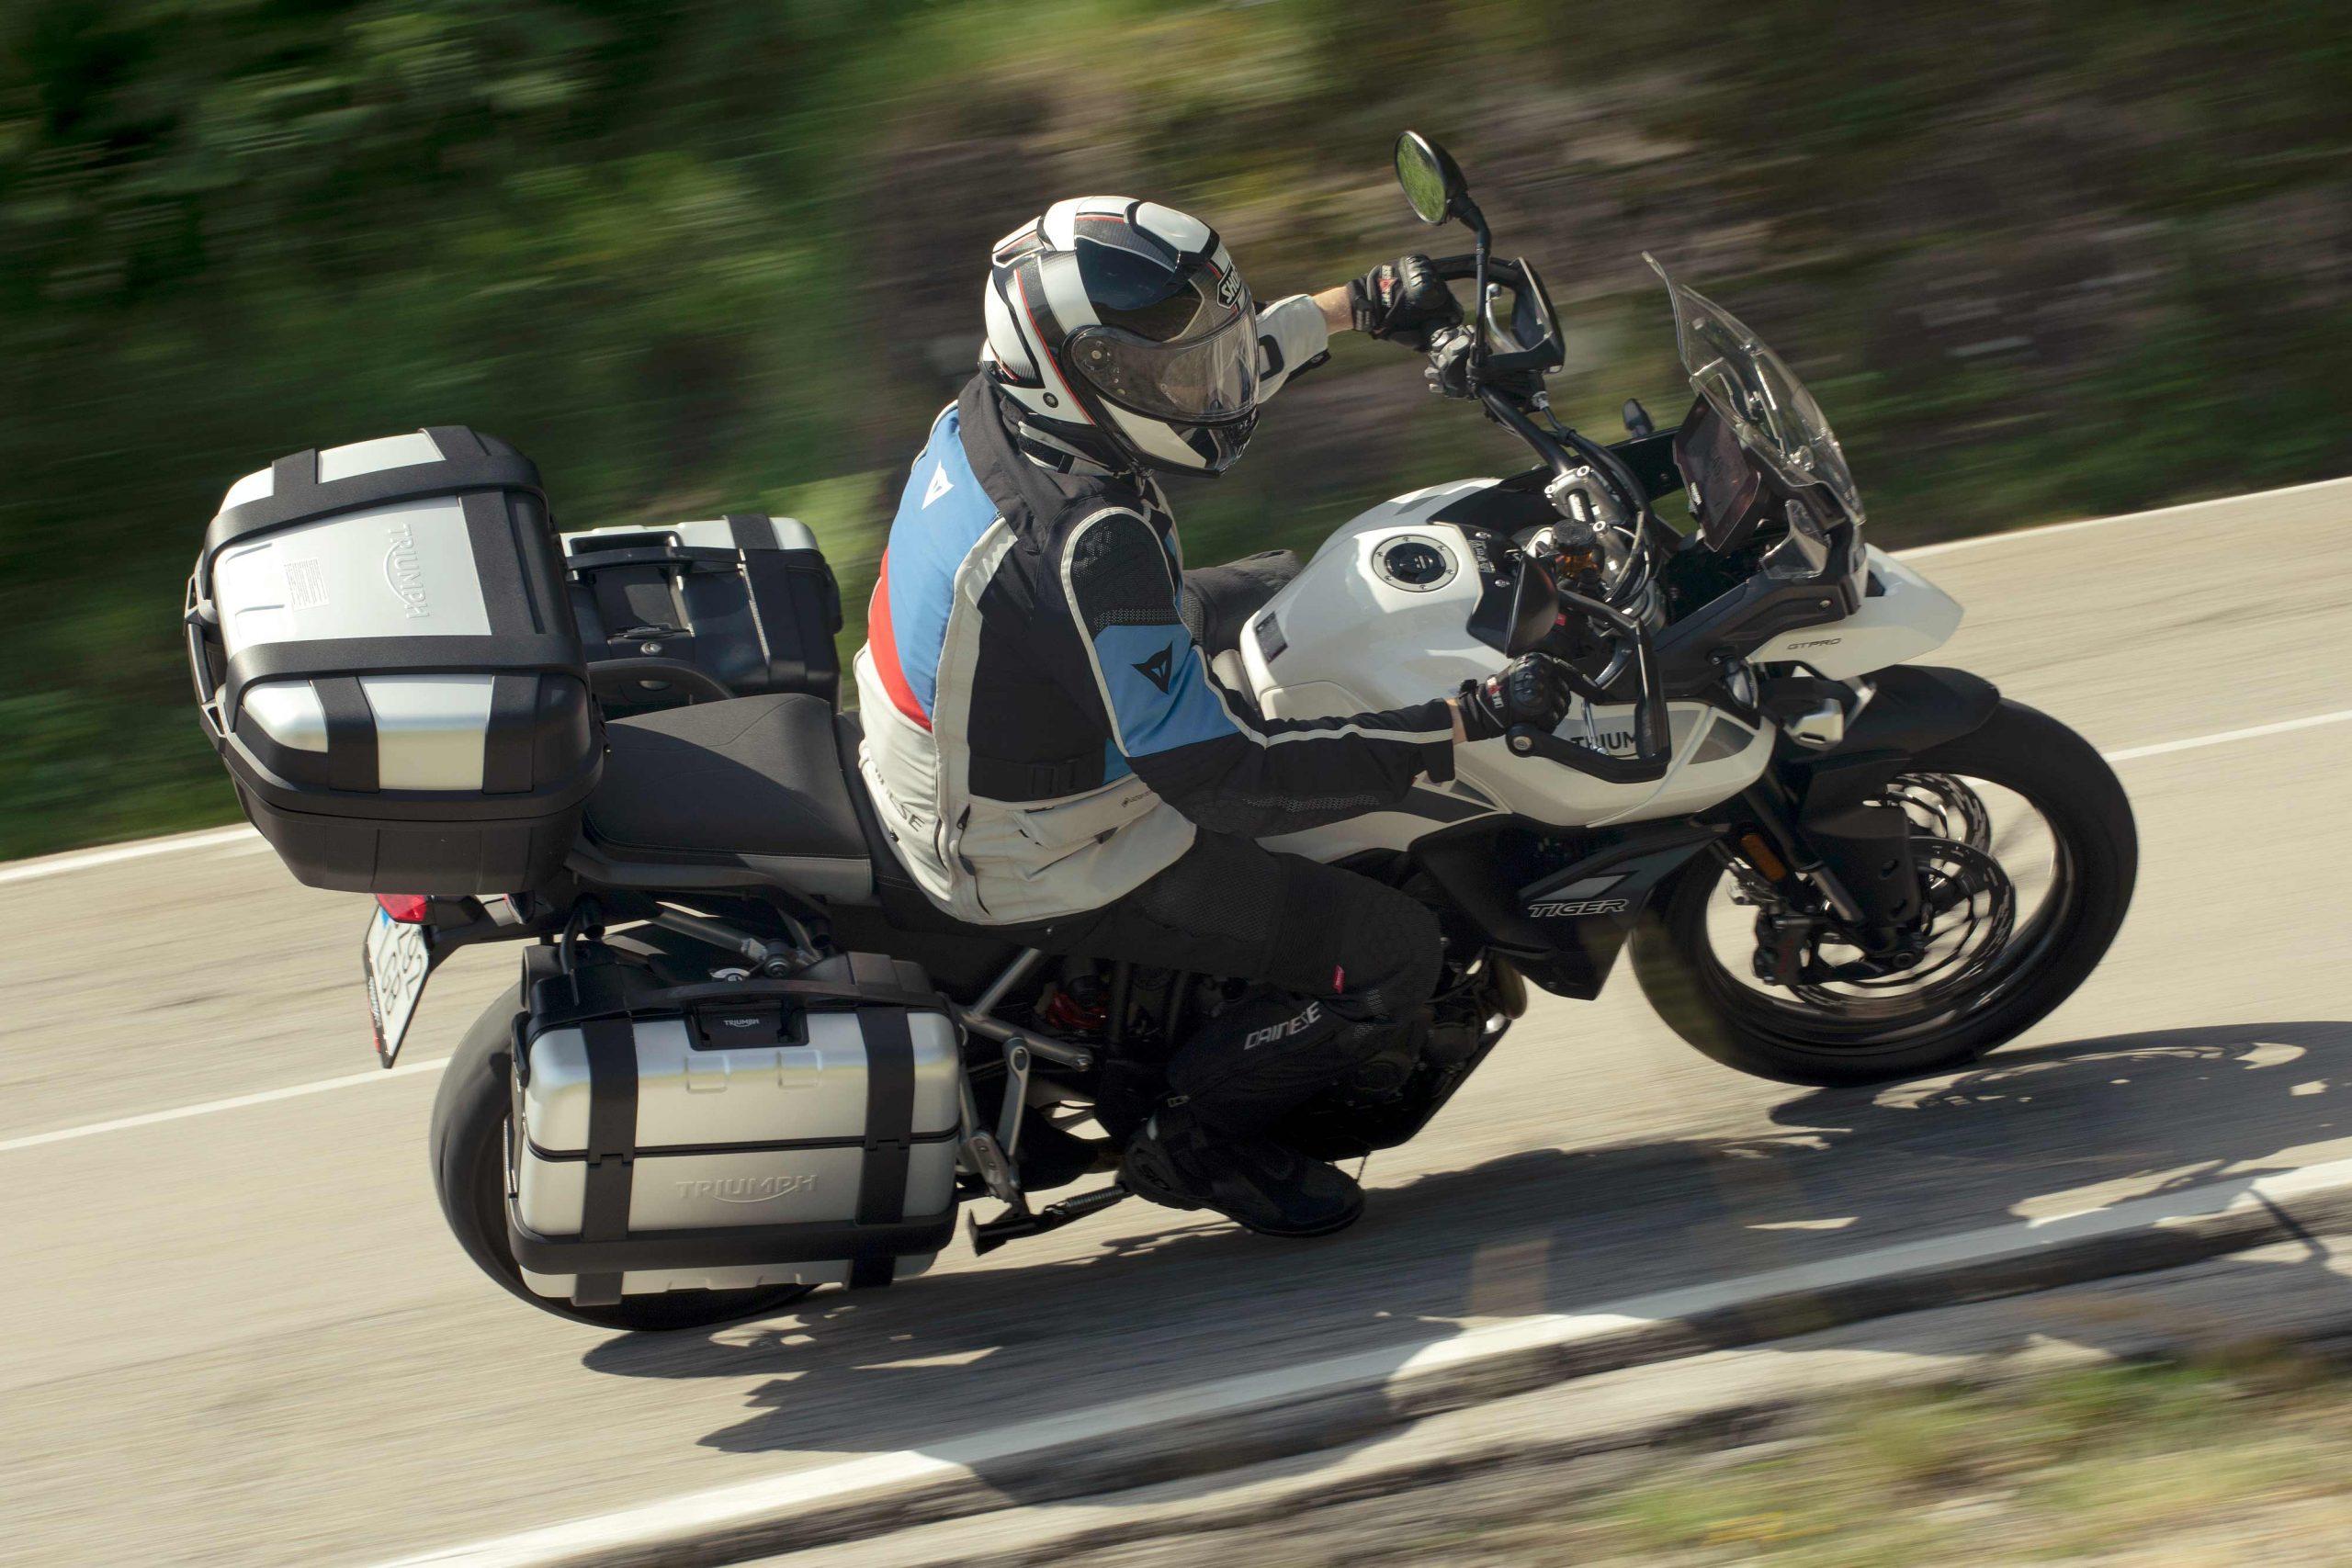 010_TriumphTiger-motosnet-mariapujol-fotografobarcelona